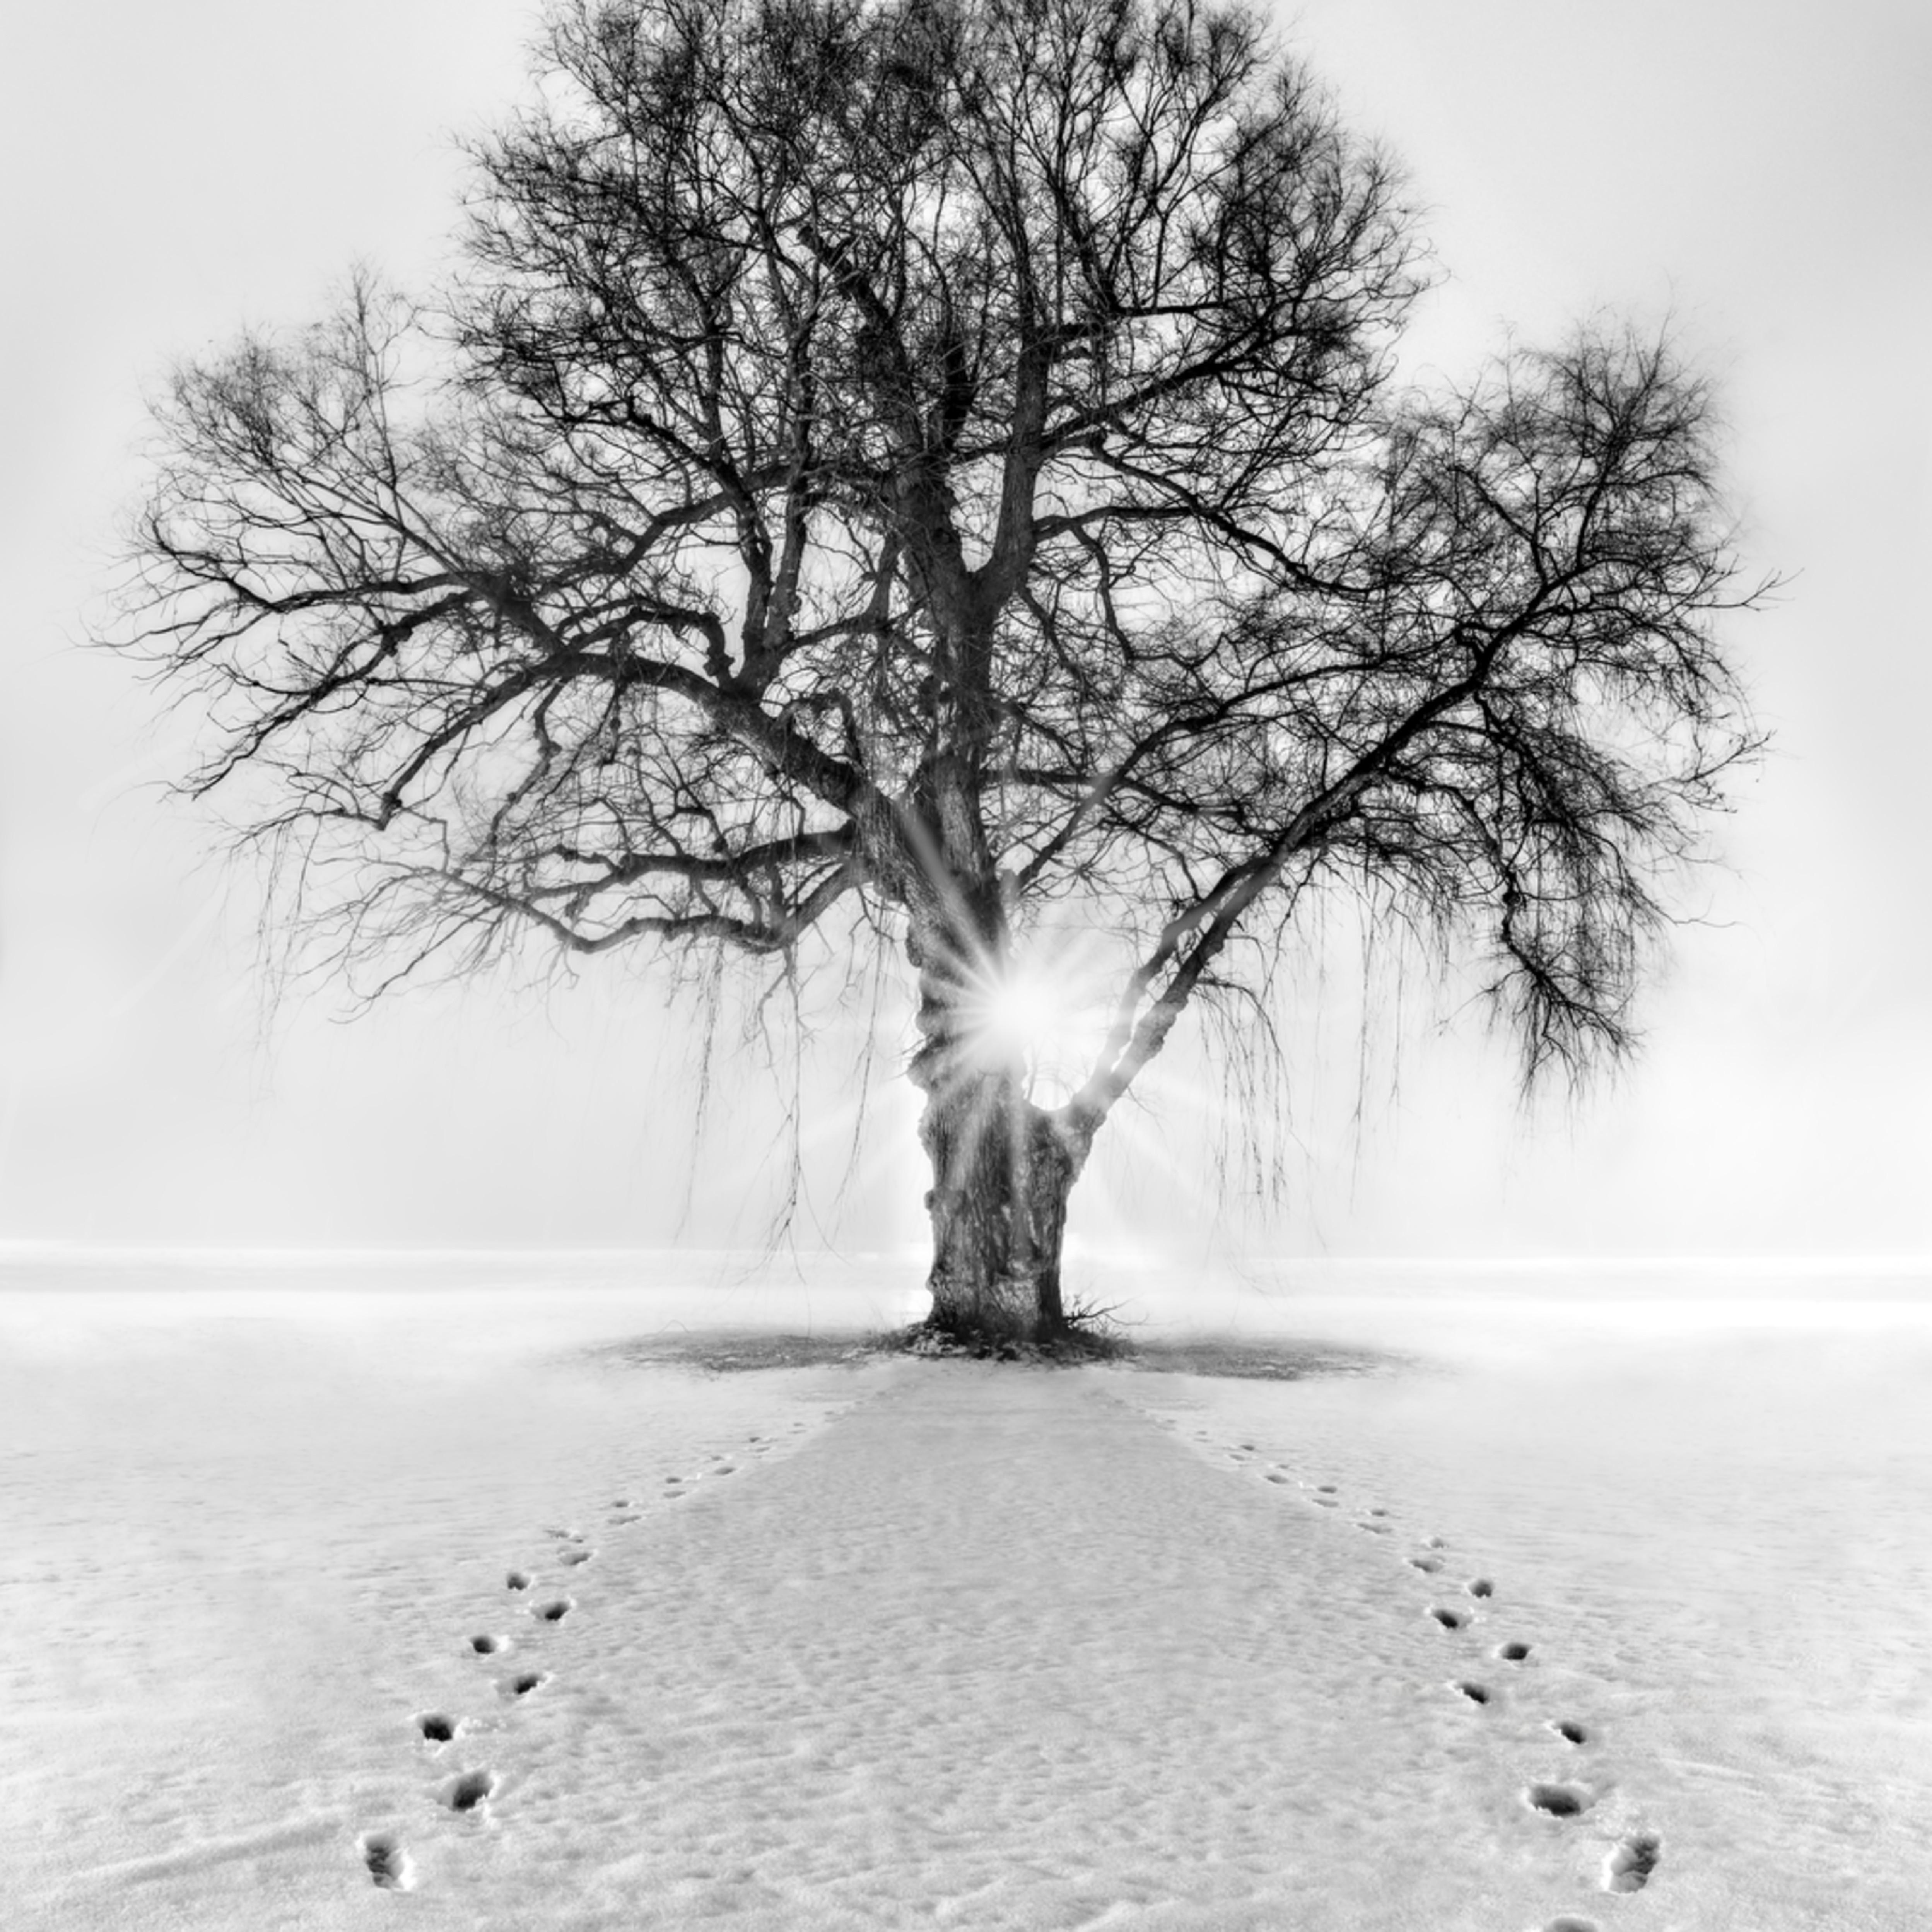 Meet me behind the kissing tree xmrreg